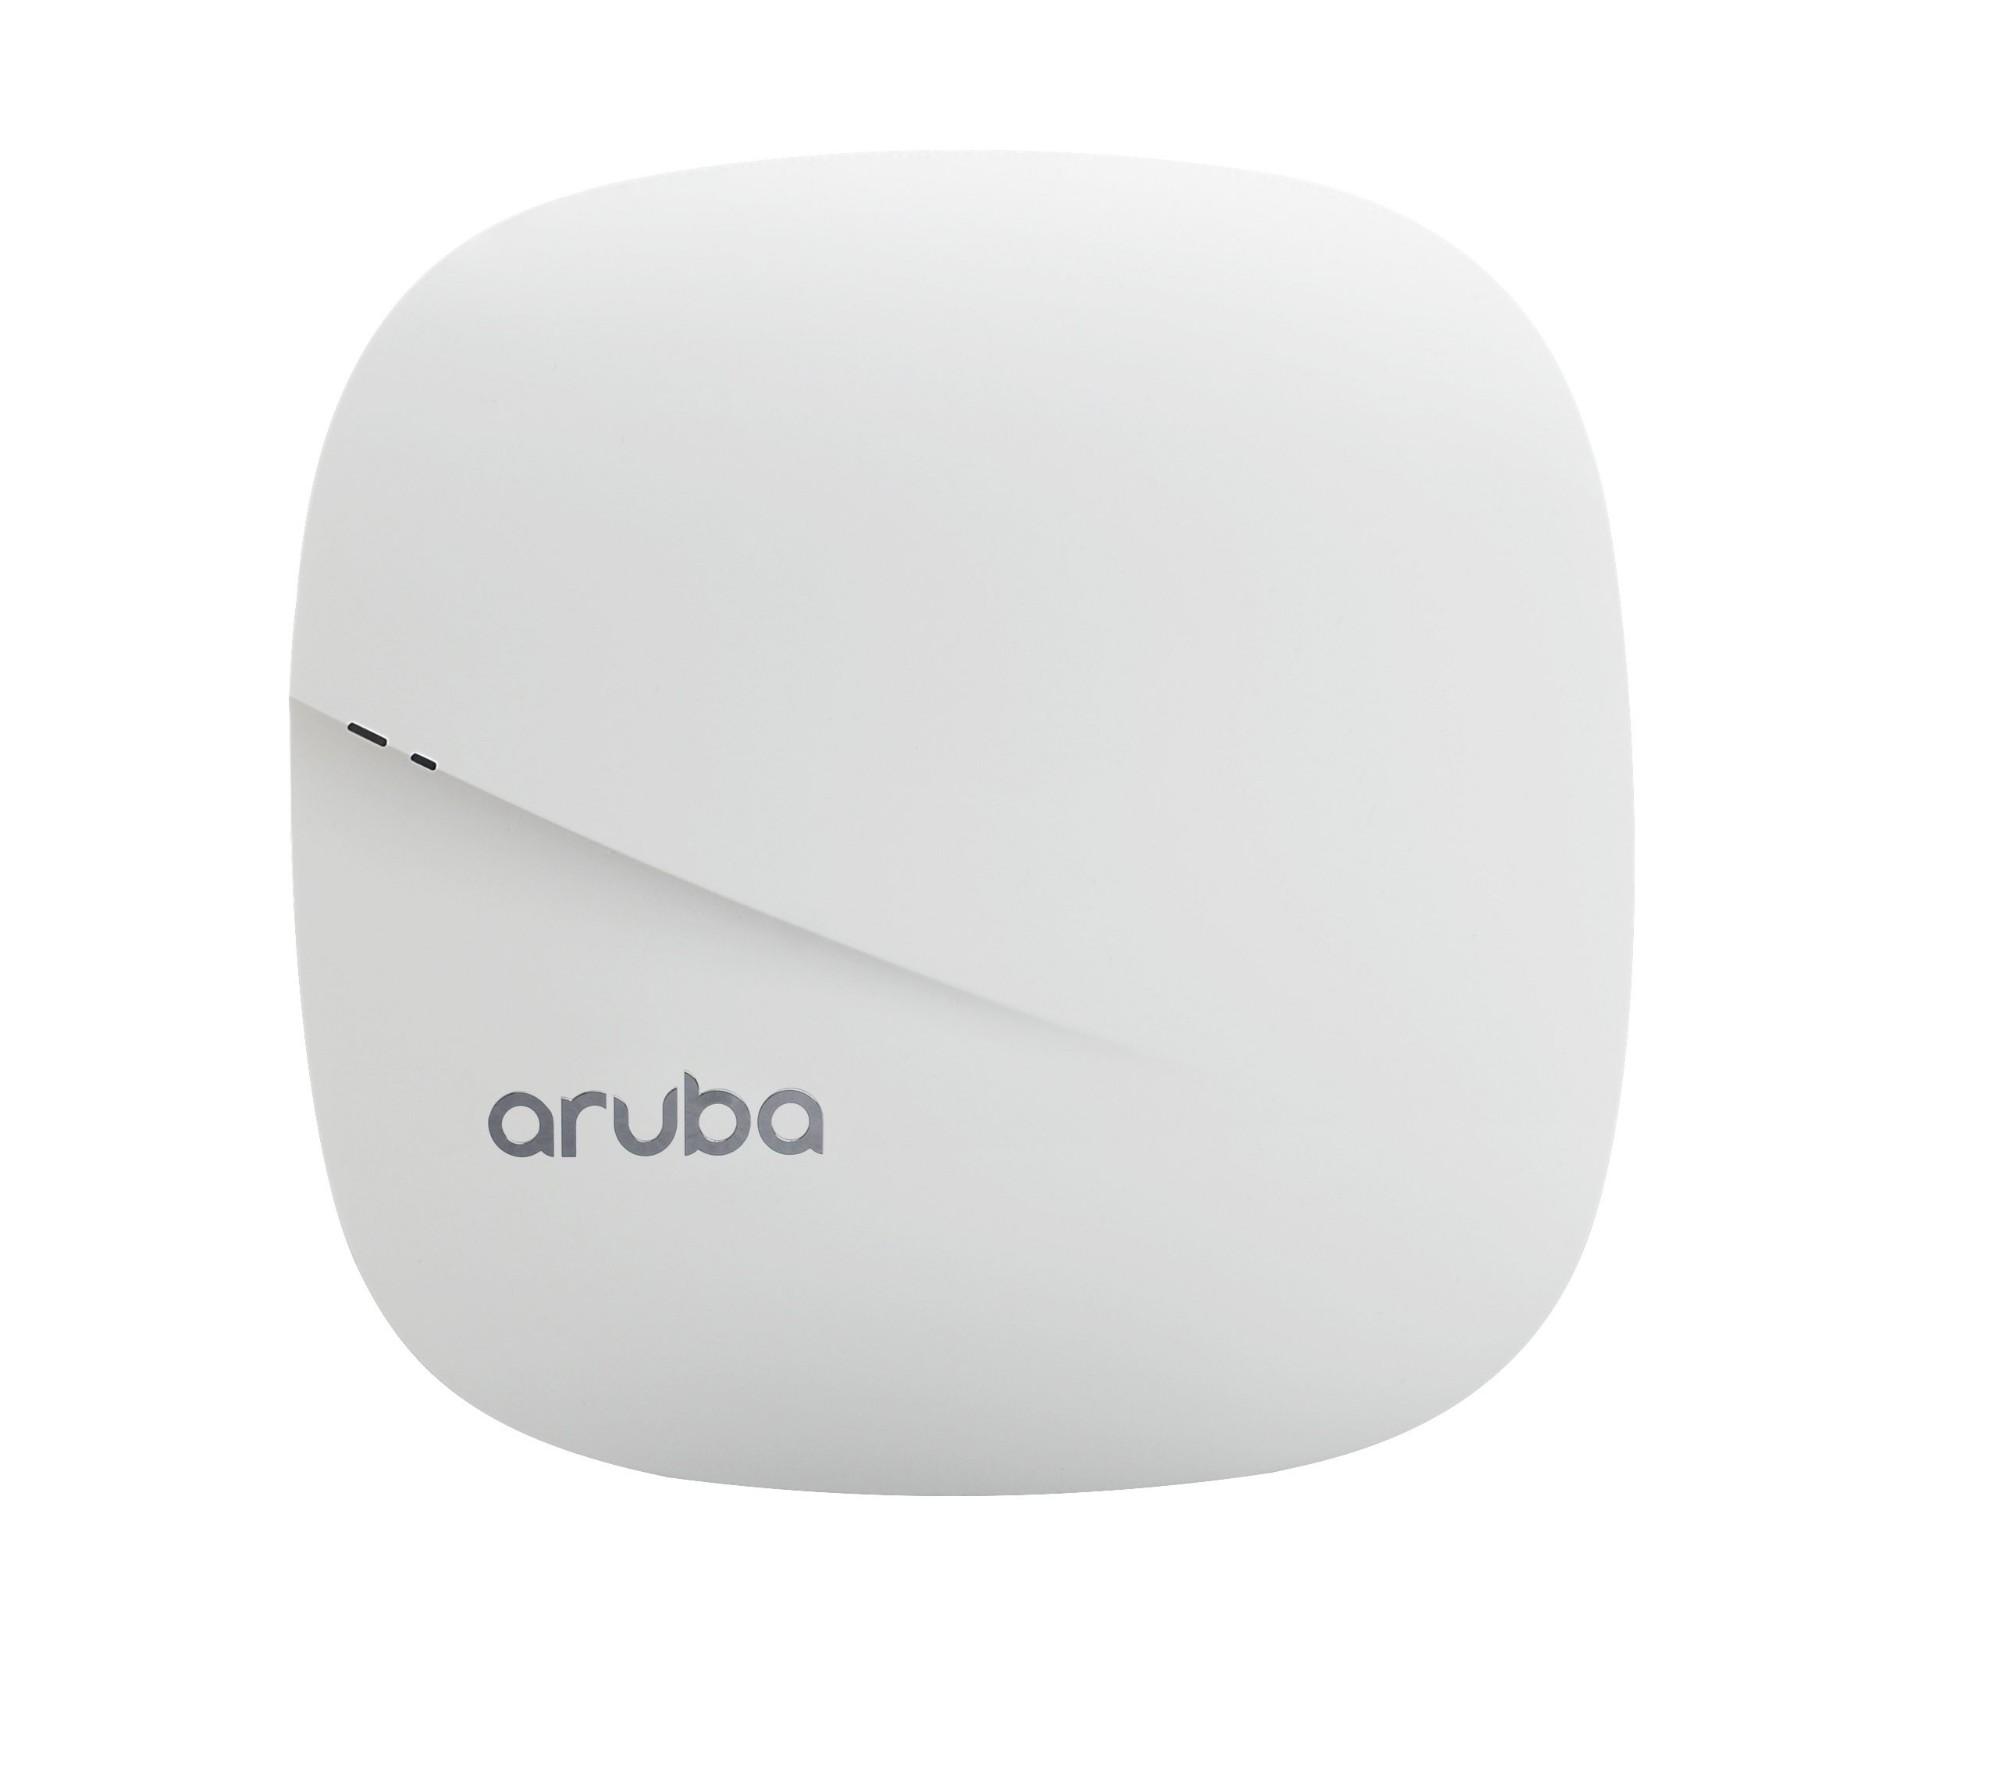 Hewlett Packard Enterprise Aruba Instant IAP-305 (RW) WLAN access point 1600 Mbit/s Power over Ethernet (PoE) White